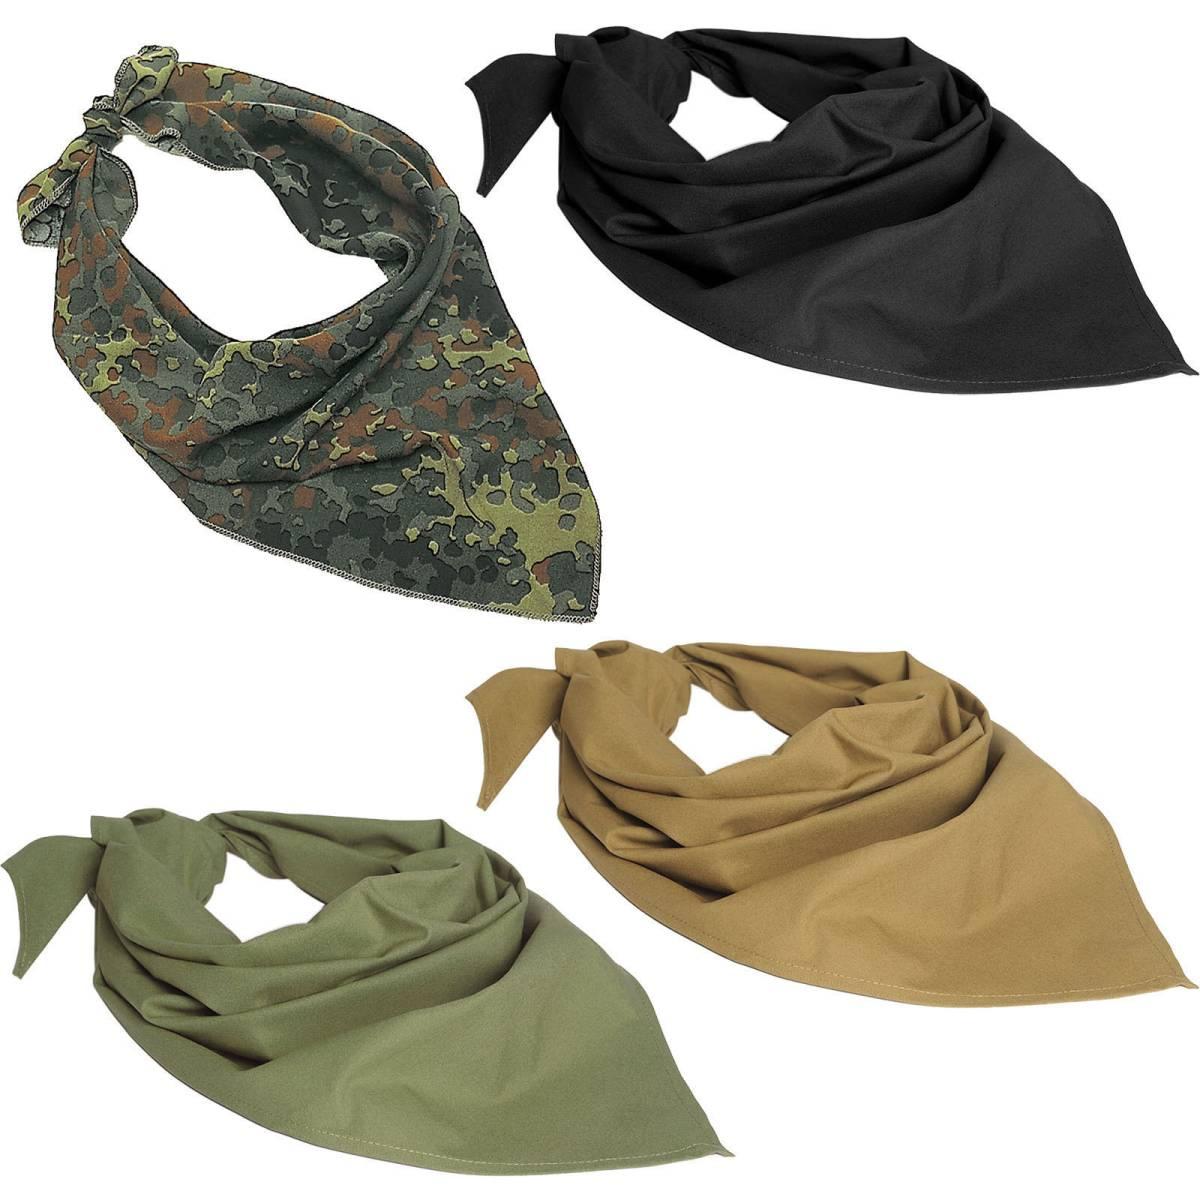 0ab3227a9ab70e BW Tücher & Schals im günstigen Army Shop   outdoorfan.de - Der große